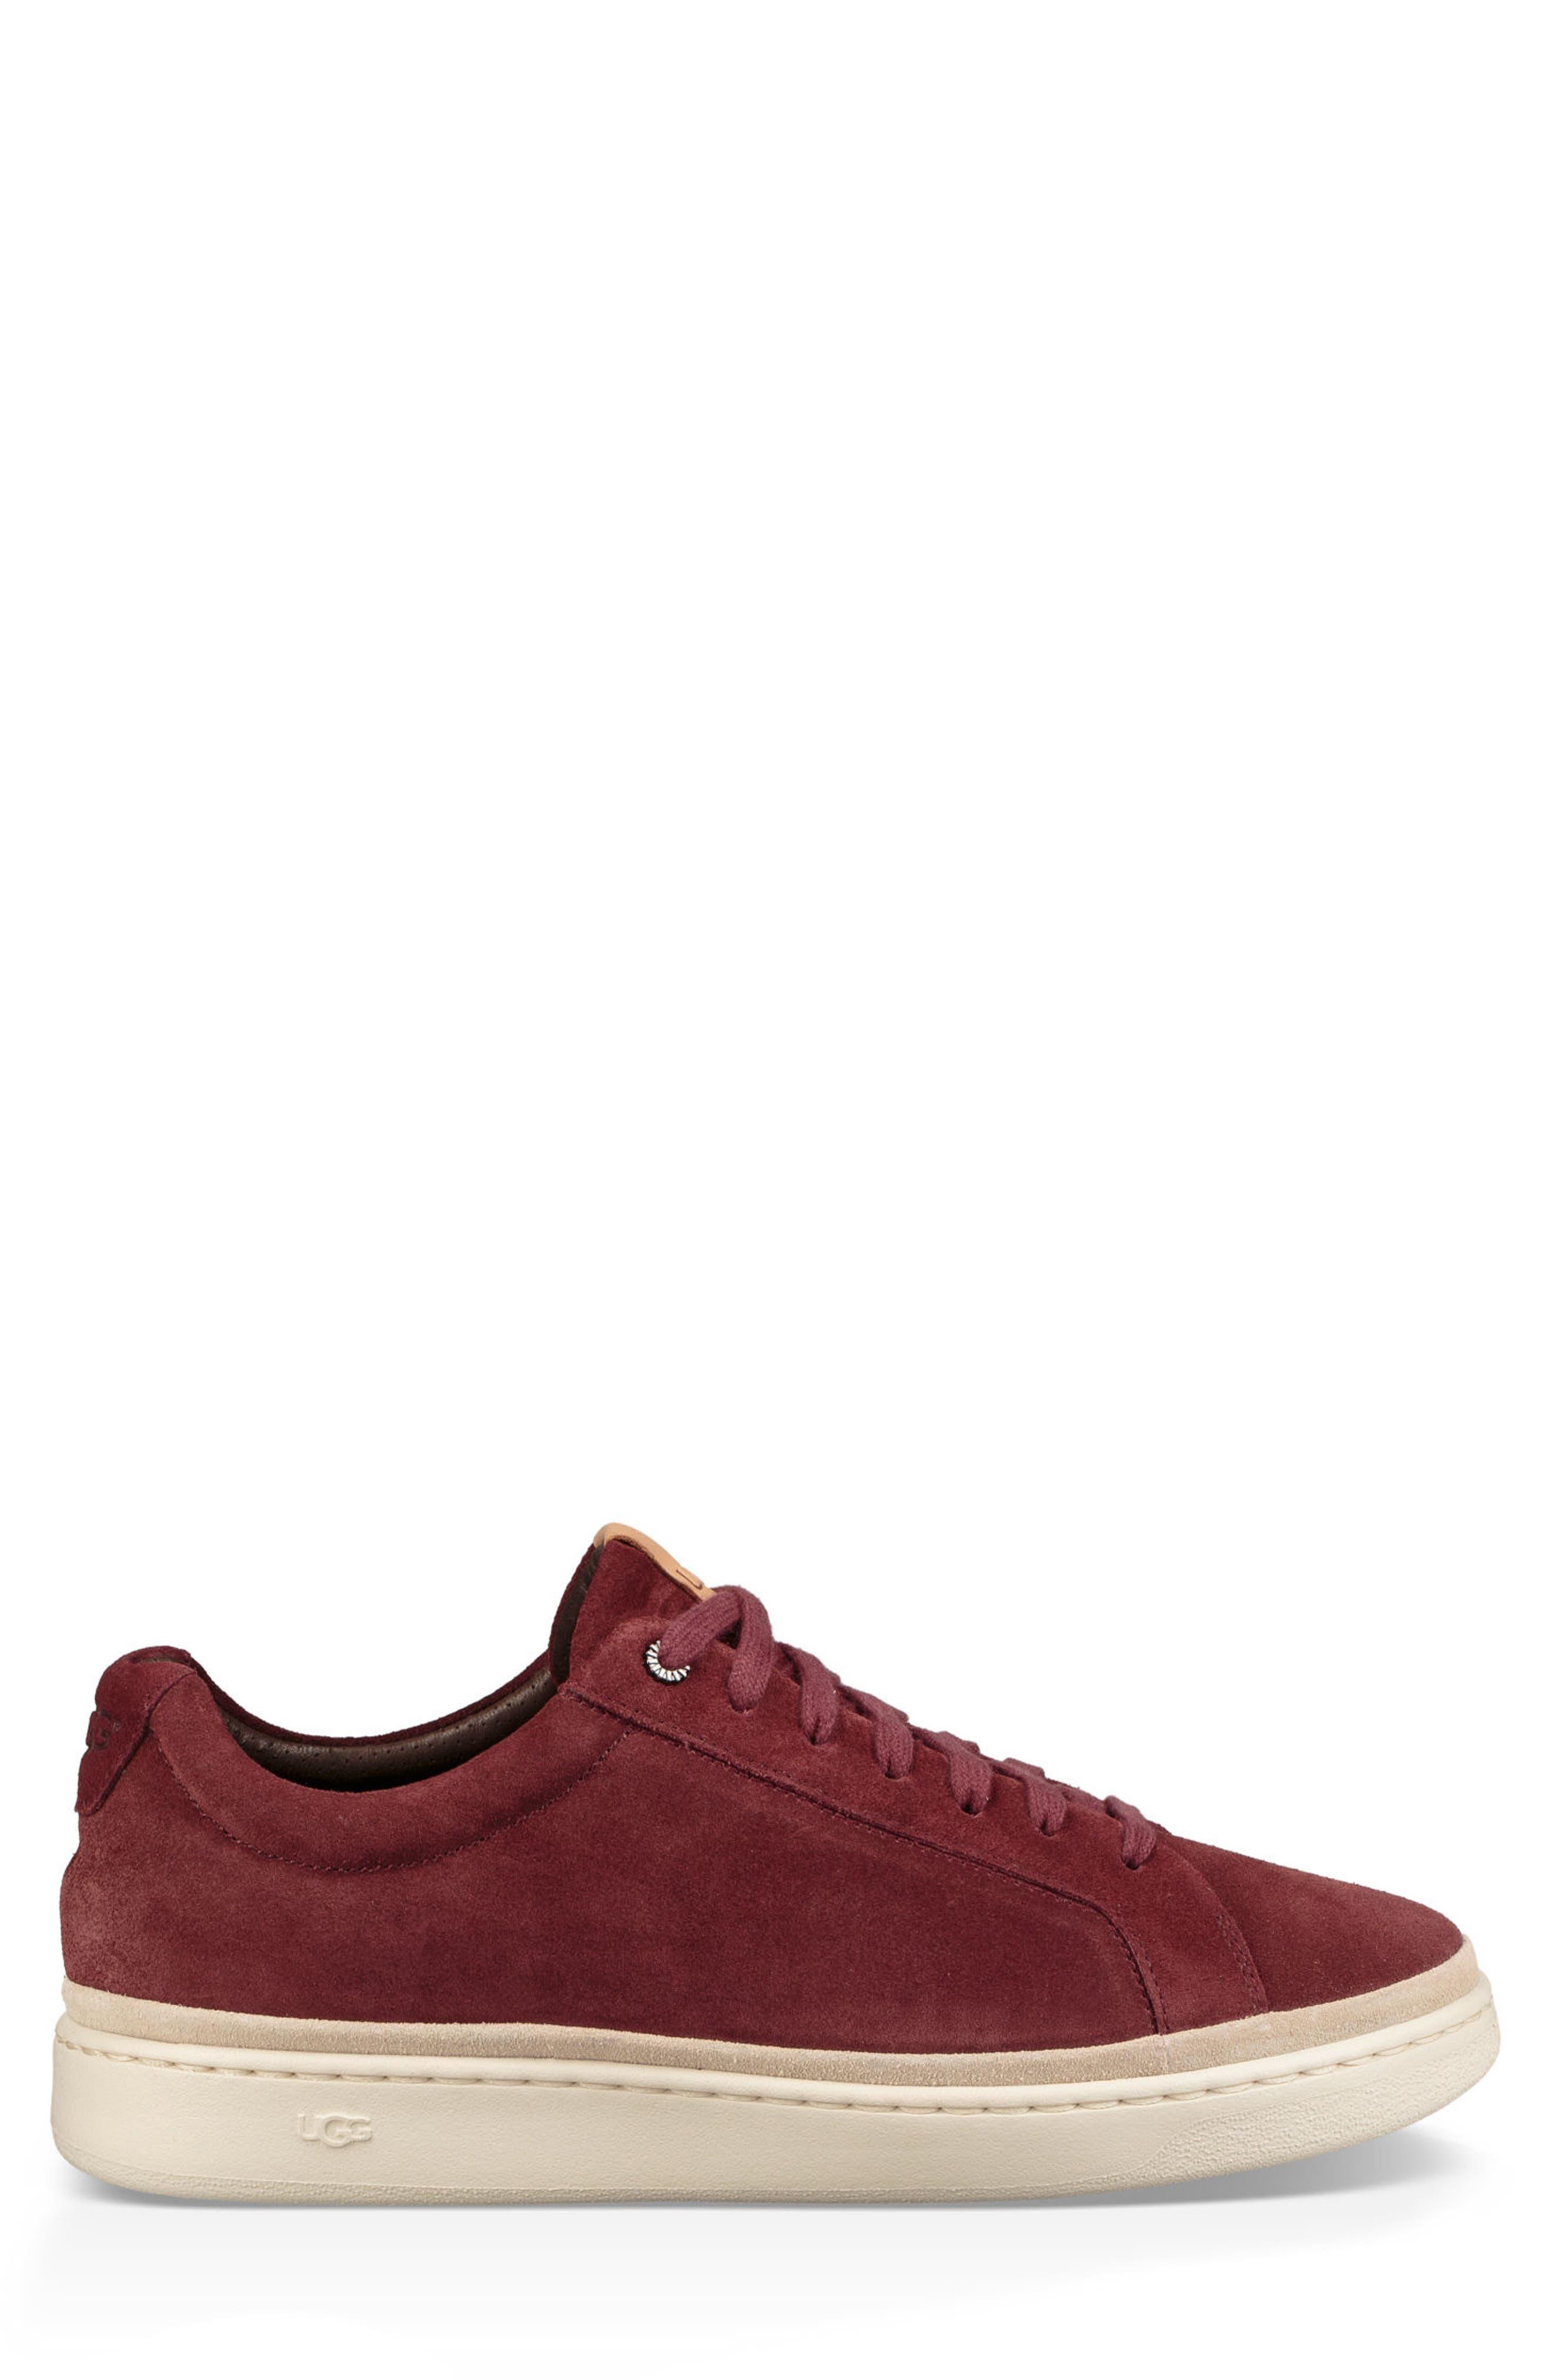 Brecken Sneaker,                             Alternate thumbnail 2, color,                             Pinot Noir Leather